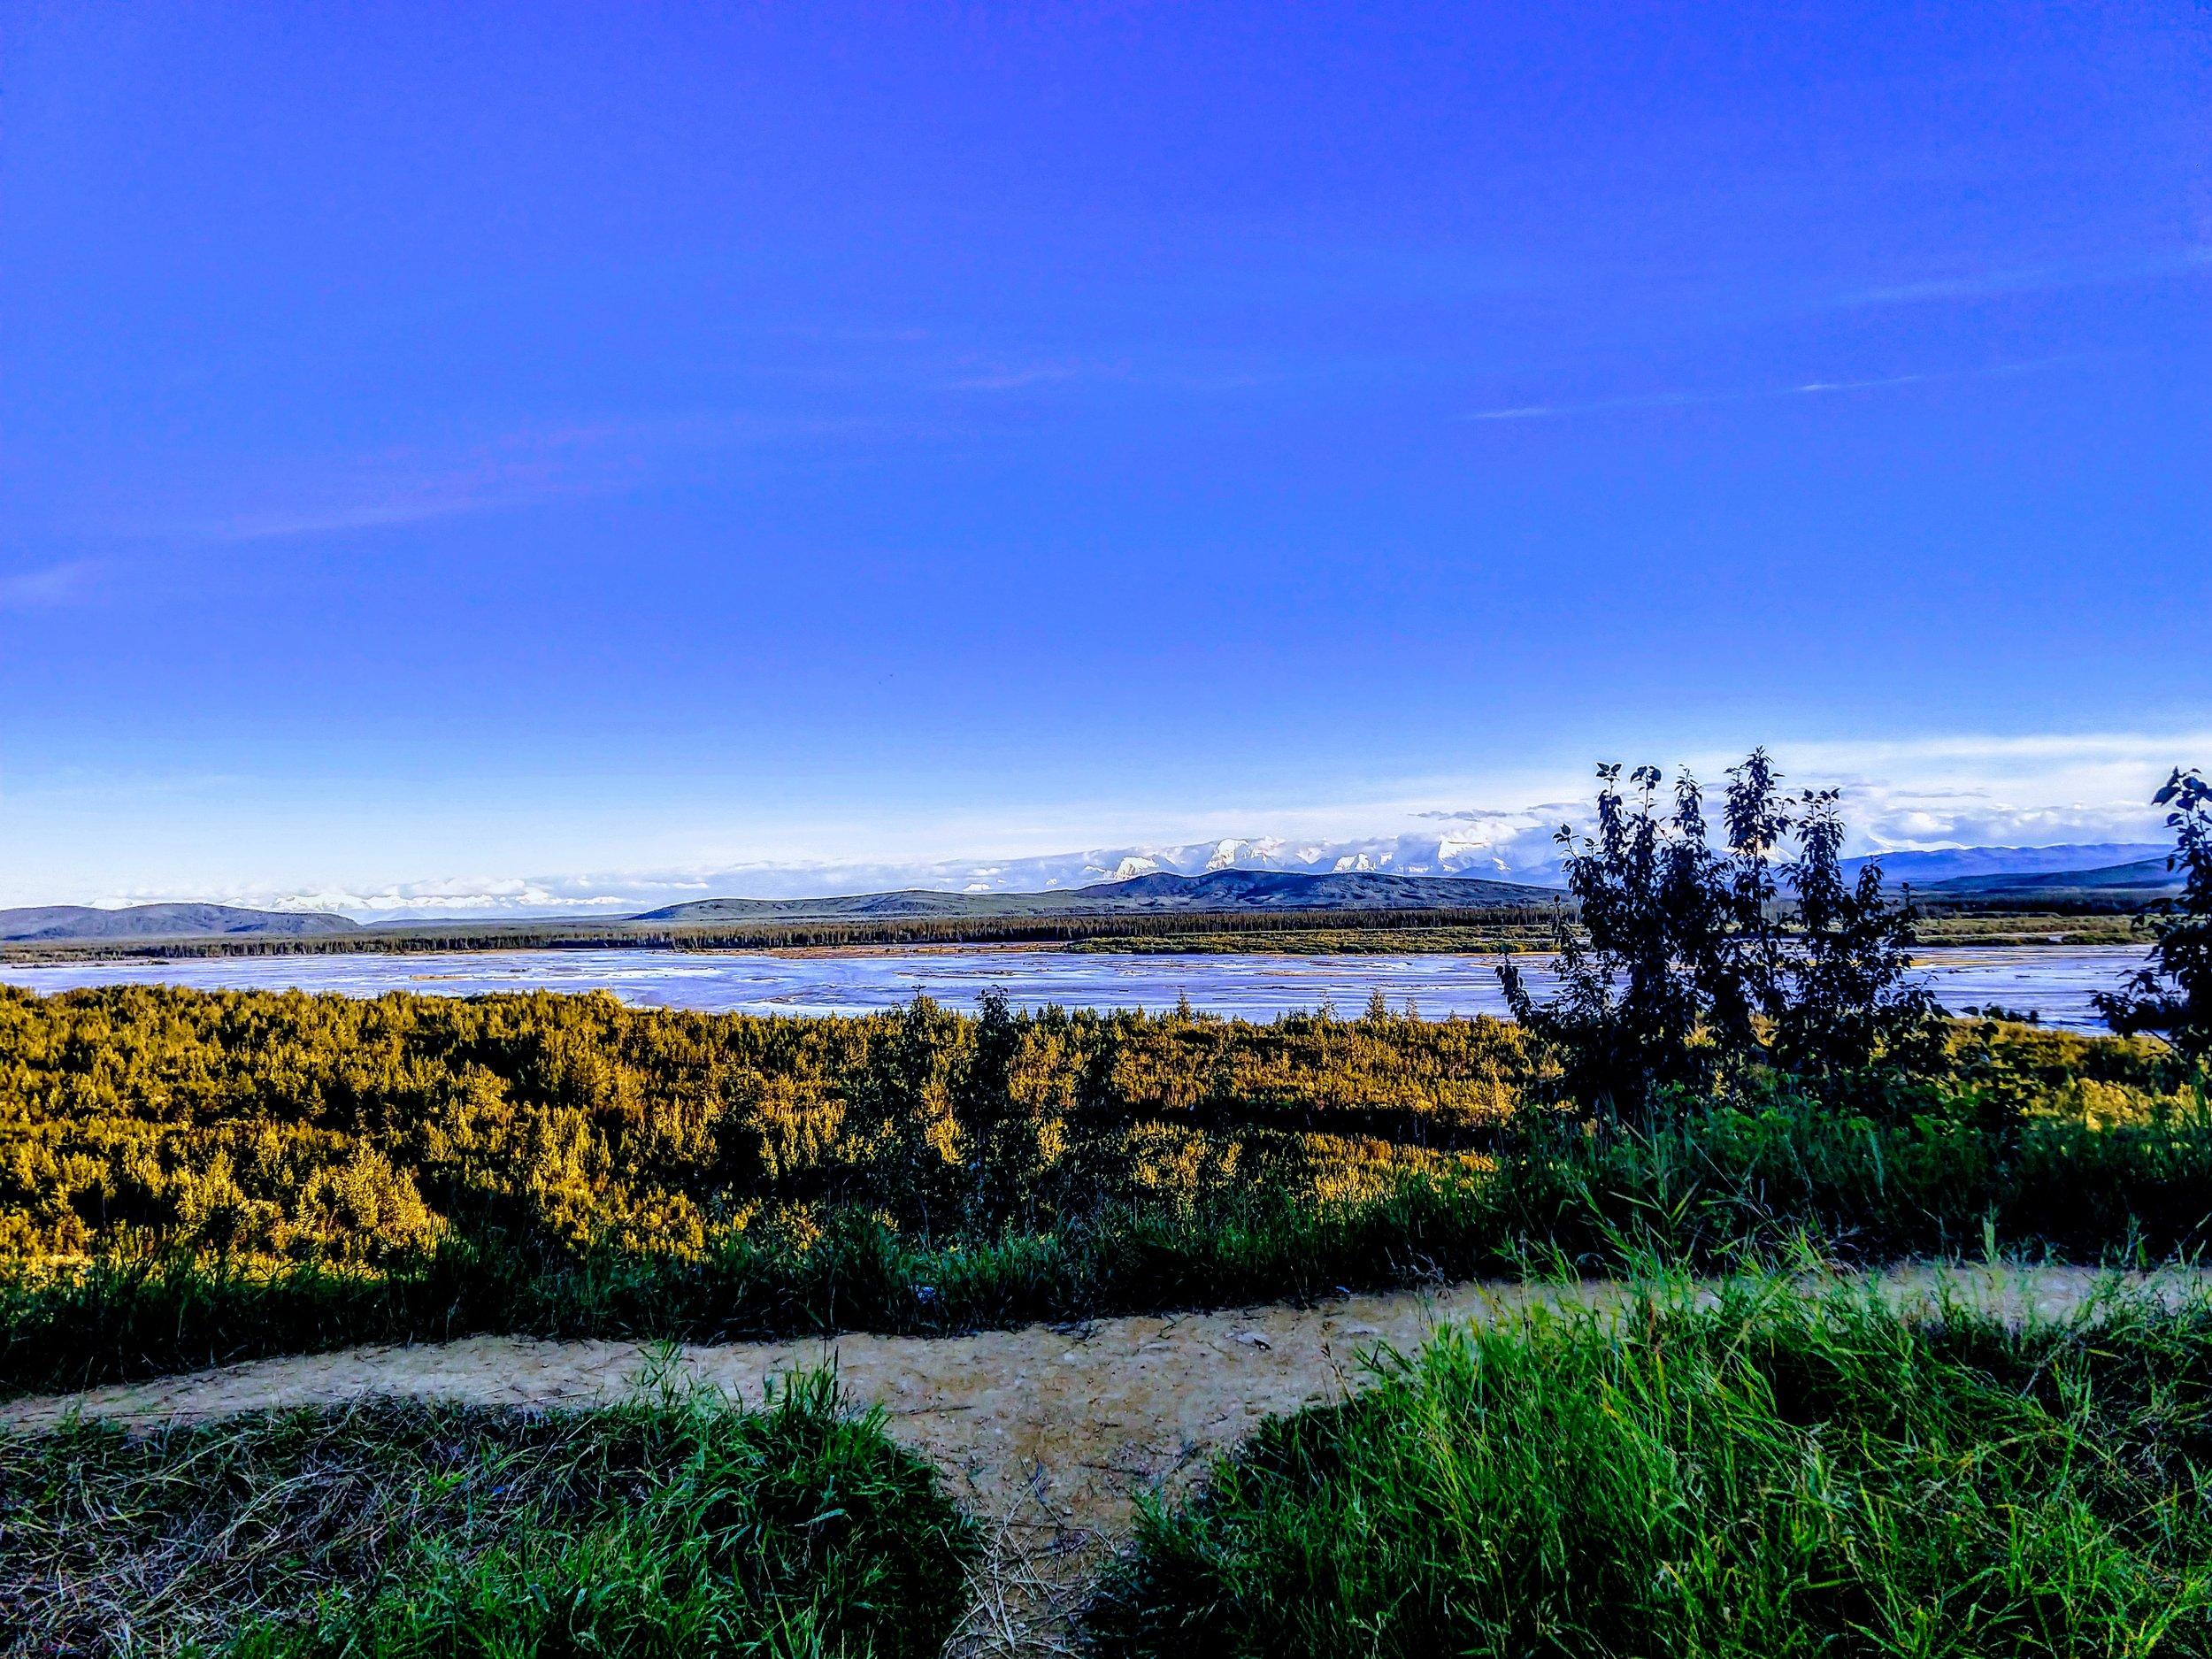 Somewhere between Fairbanks and Tok, AK